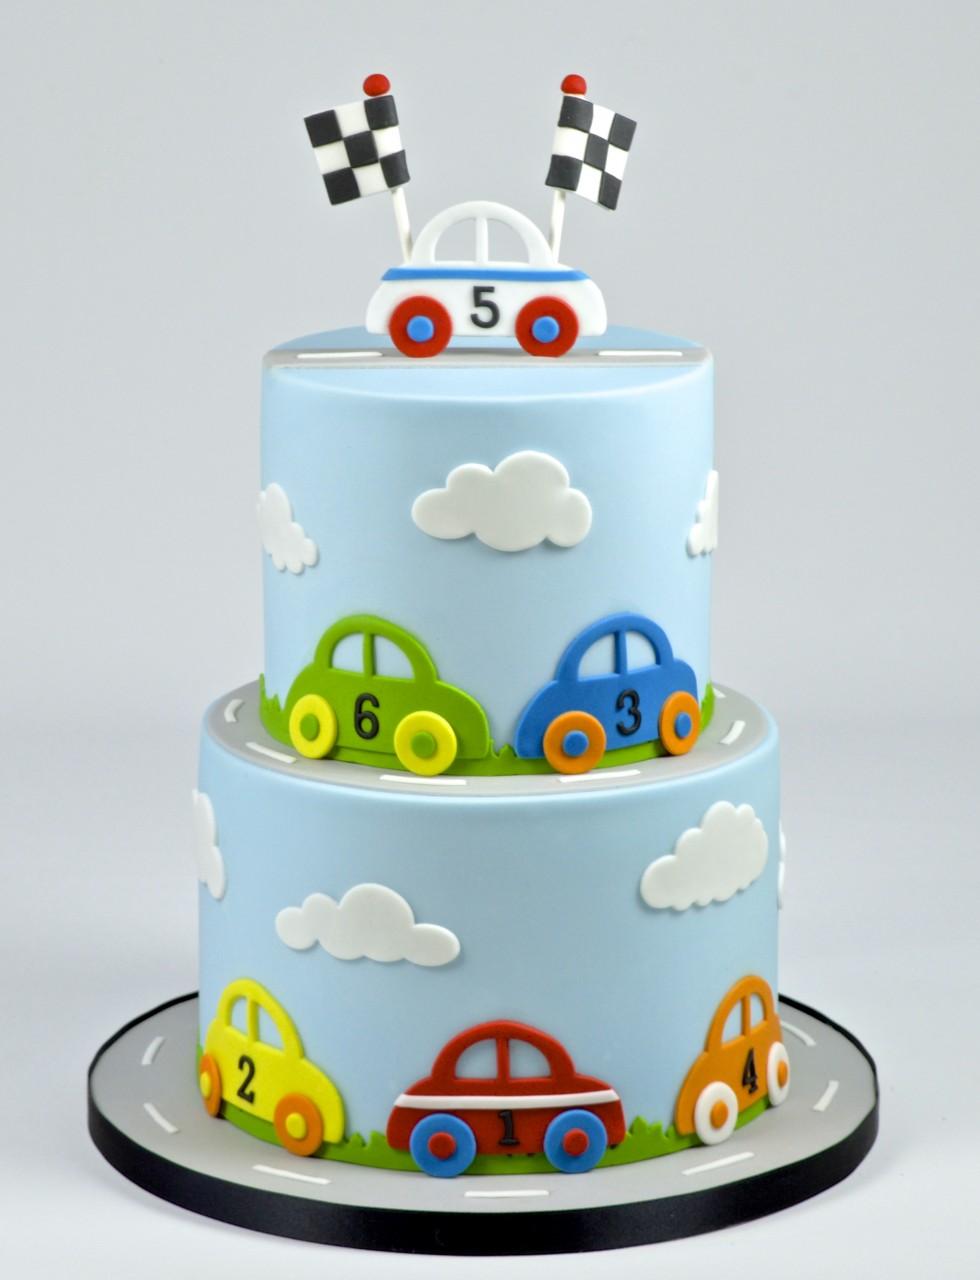 Fmm Cute Car Cutter Set Cake Icing Decoration Decorating Sugarcraft